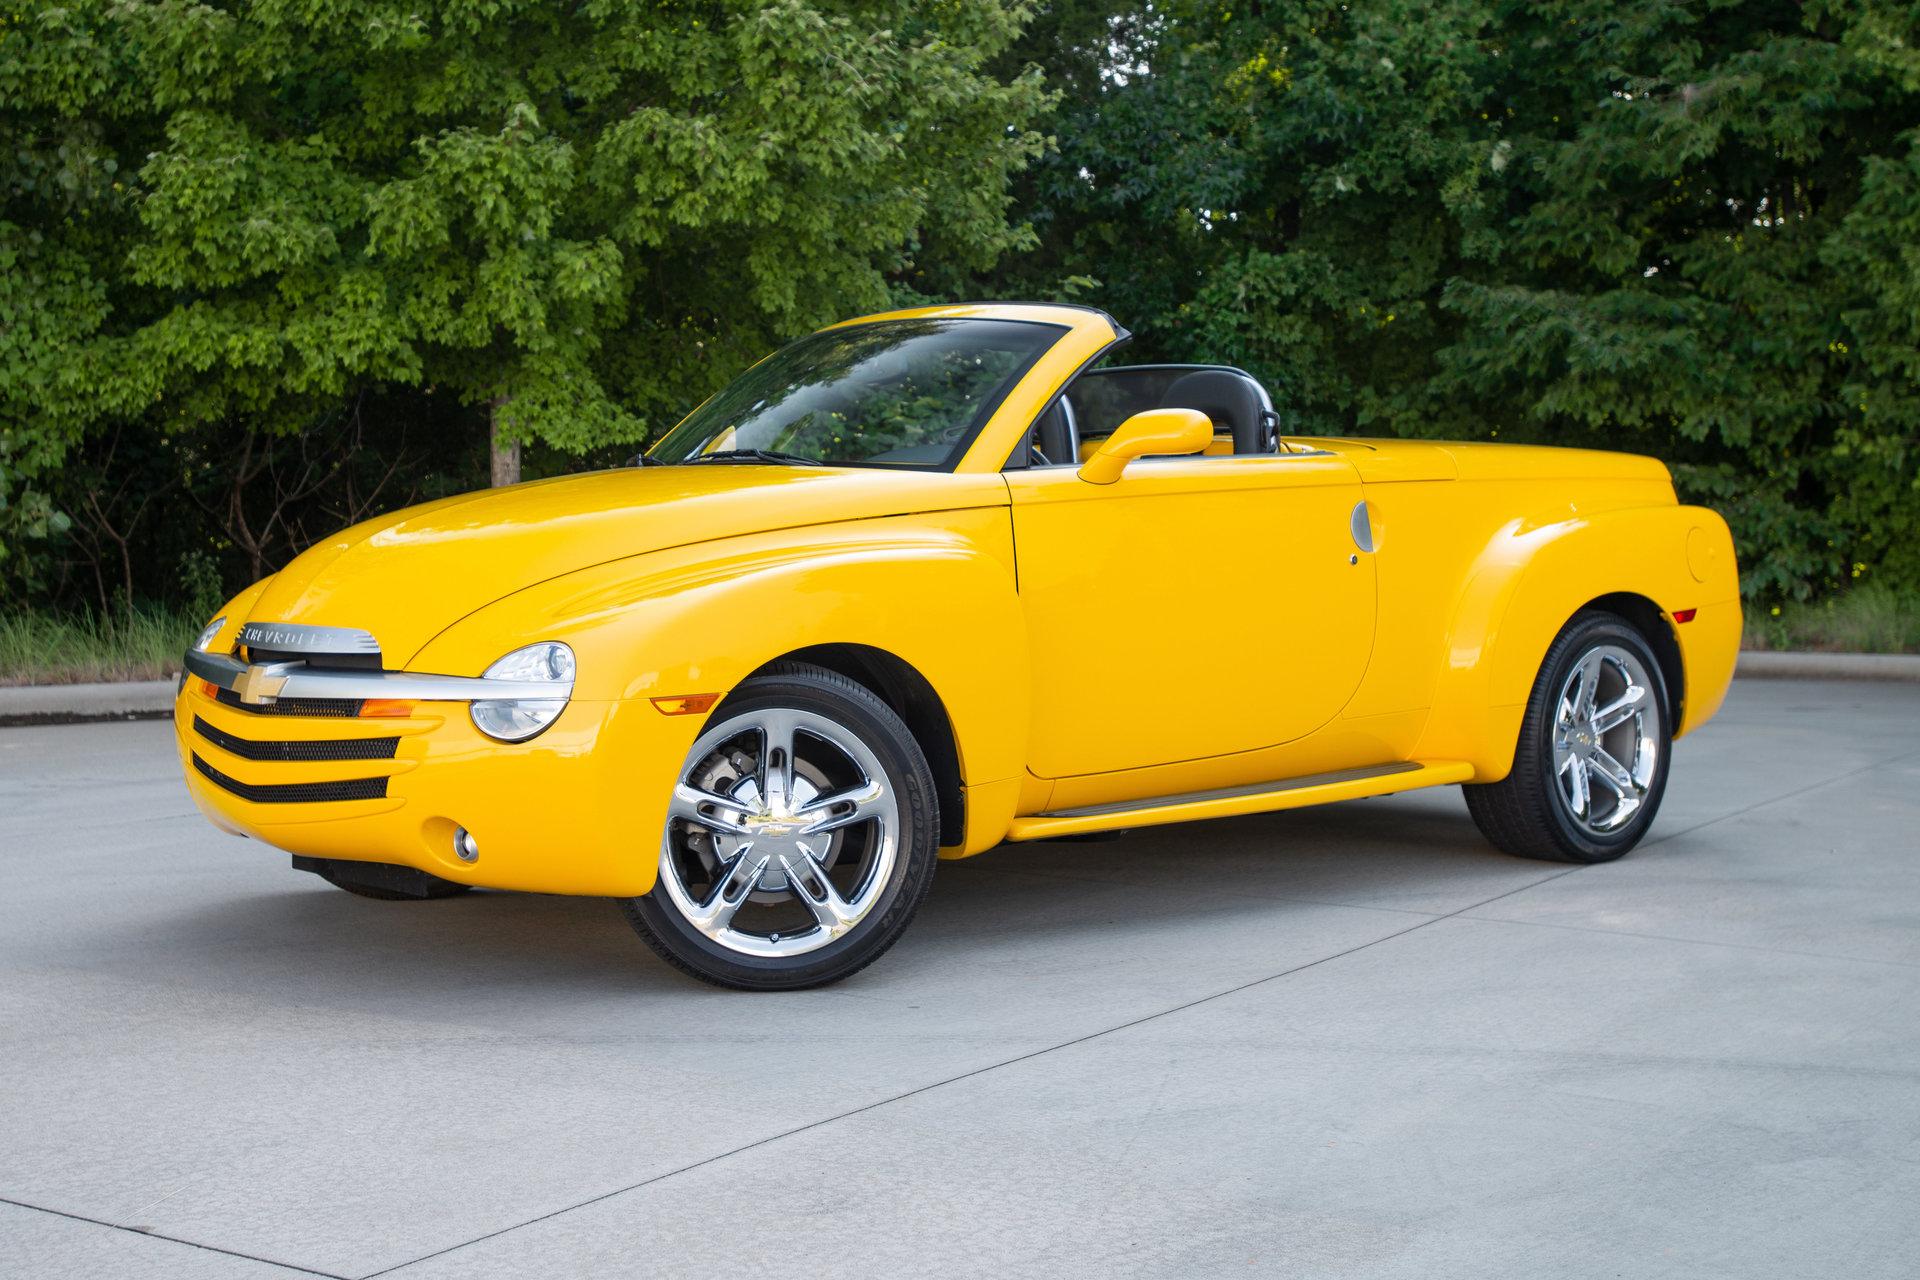 For Sale 2005 Chevrolet SSR For Sale 2005 Chevrolet SSR ...